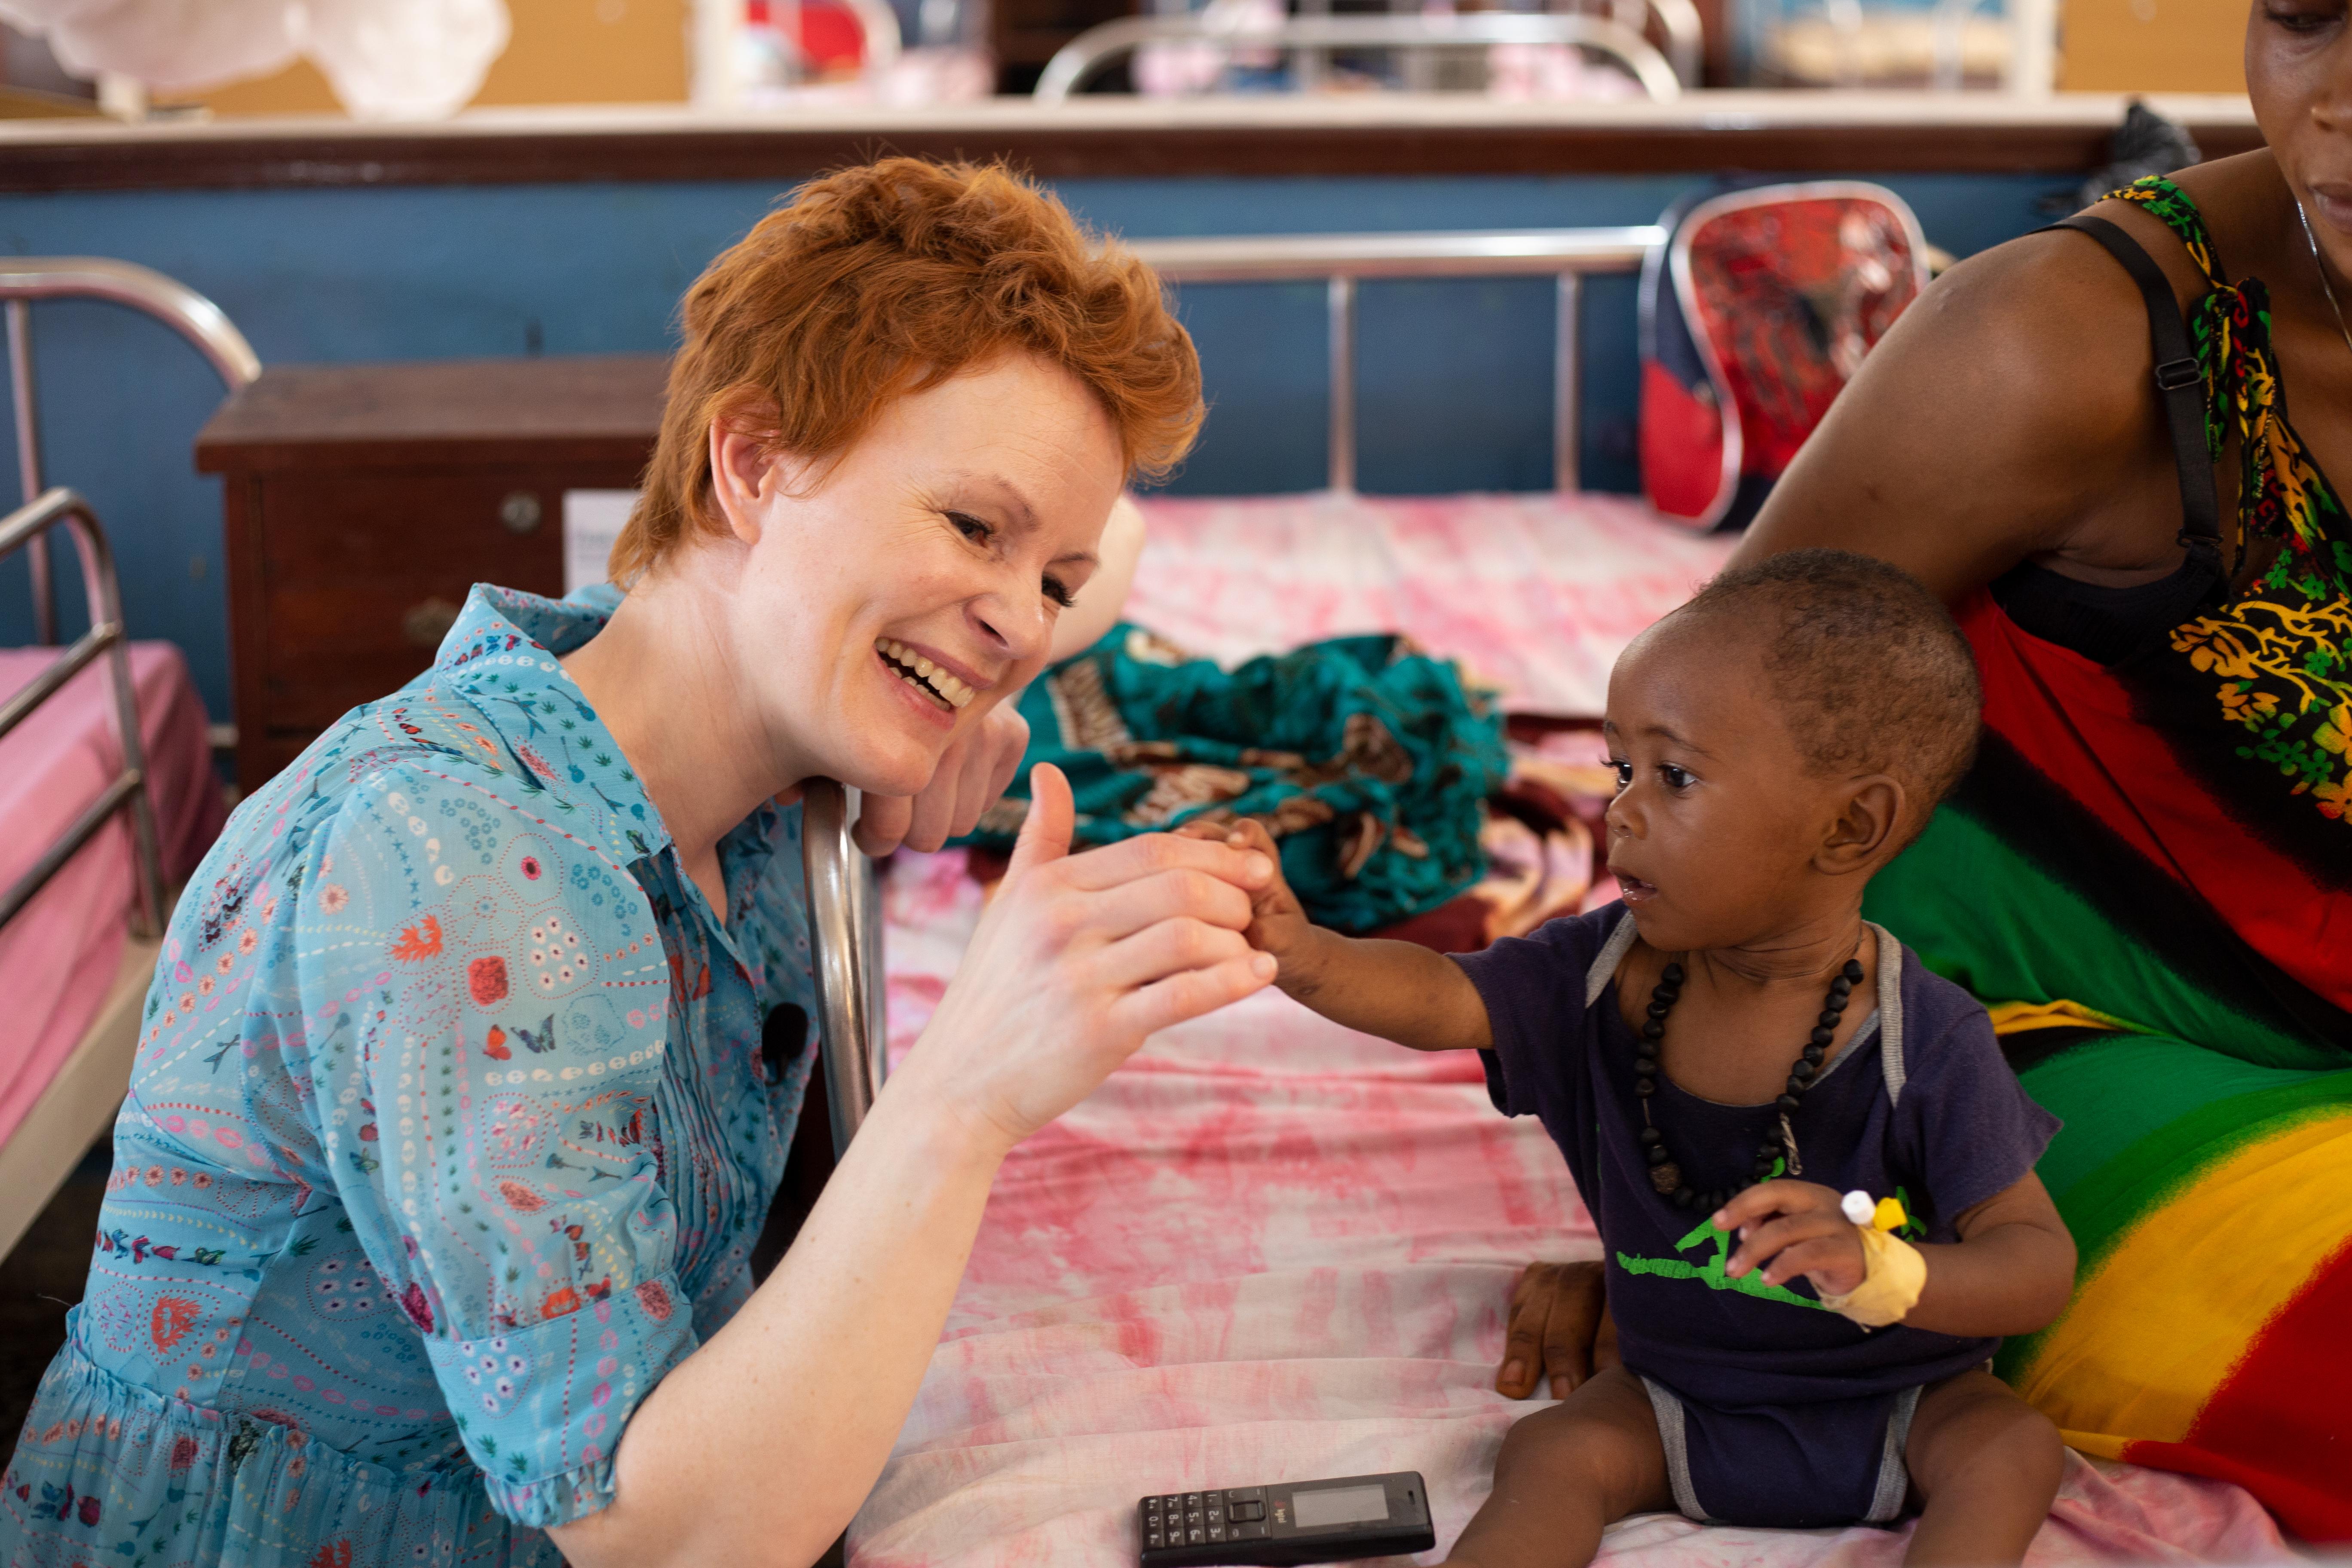 Minna Haapkylä vieraili Sierra Leonessa. Kuva: © UNICEF/Sierra Leone 2020/Wallenius.